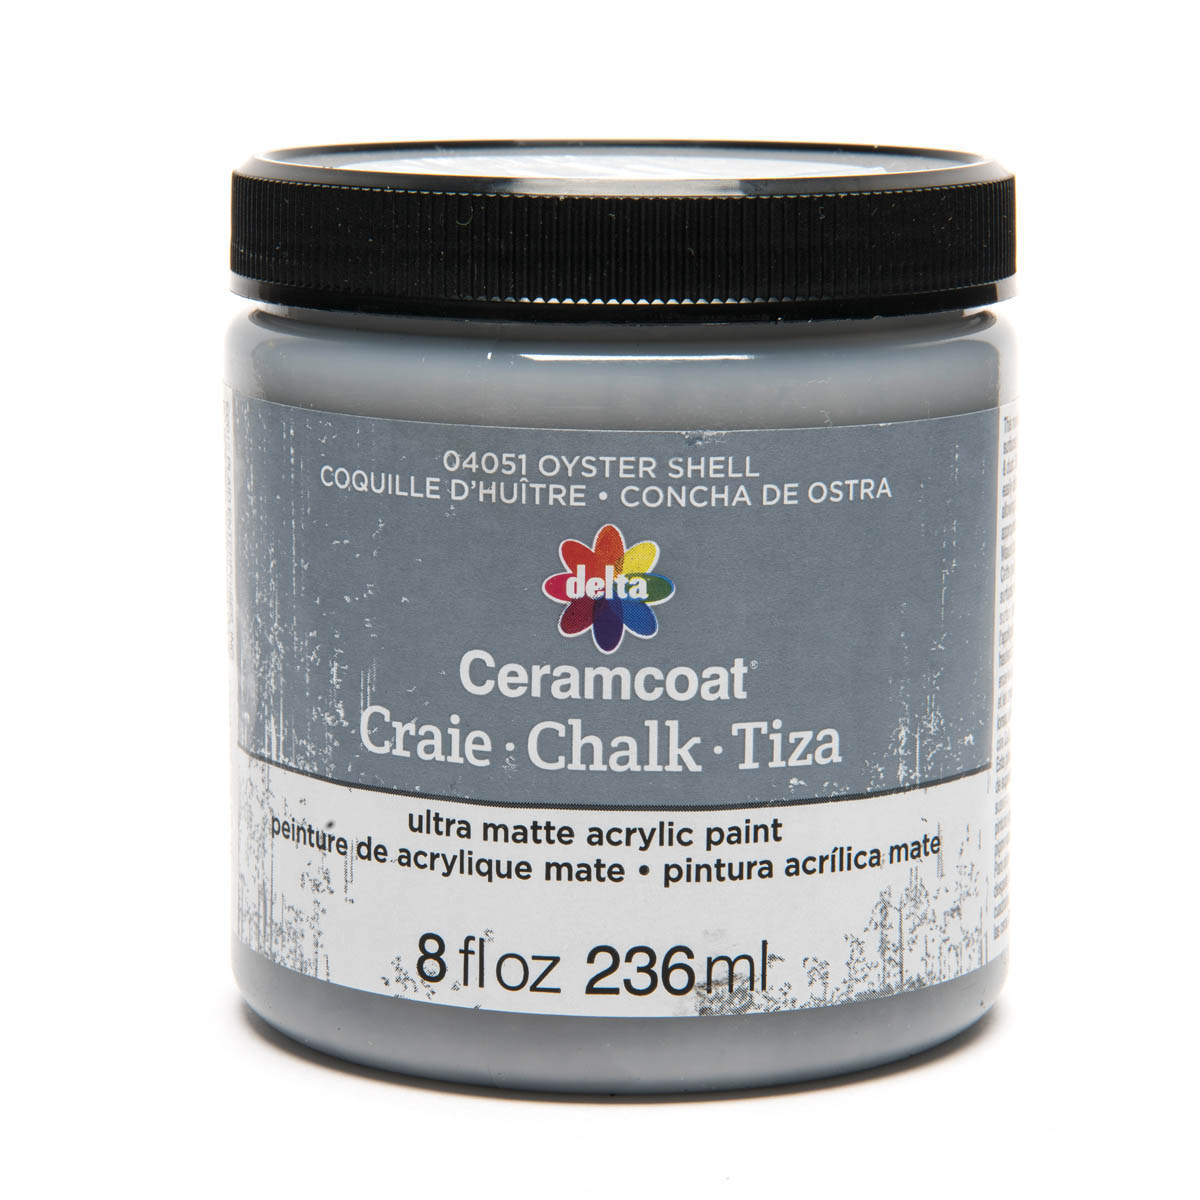 Delta Ceramcoat ® Chalk - Oyster Shell, 8 oz.